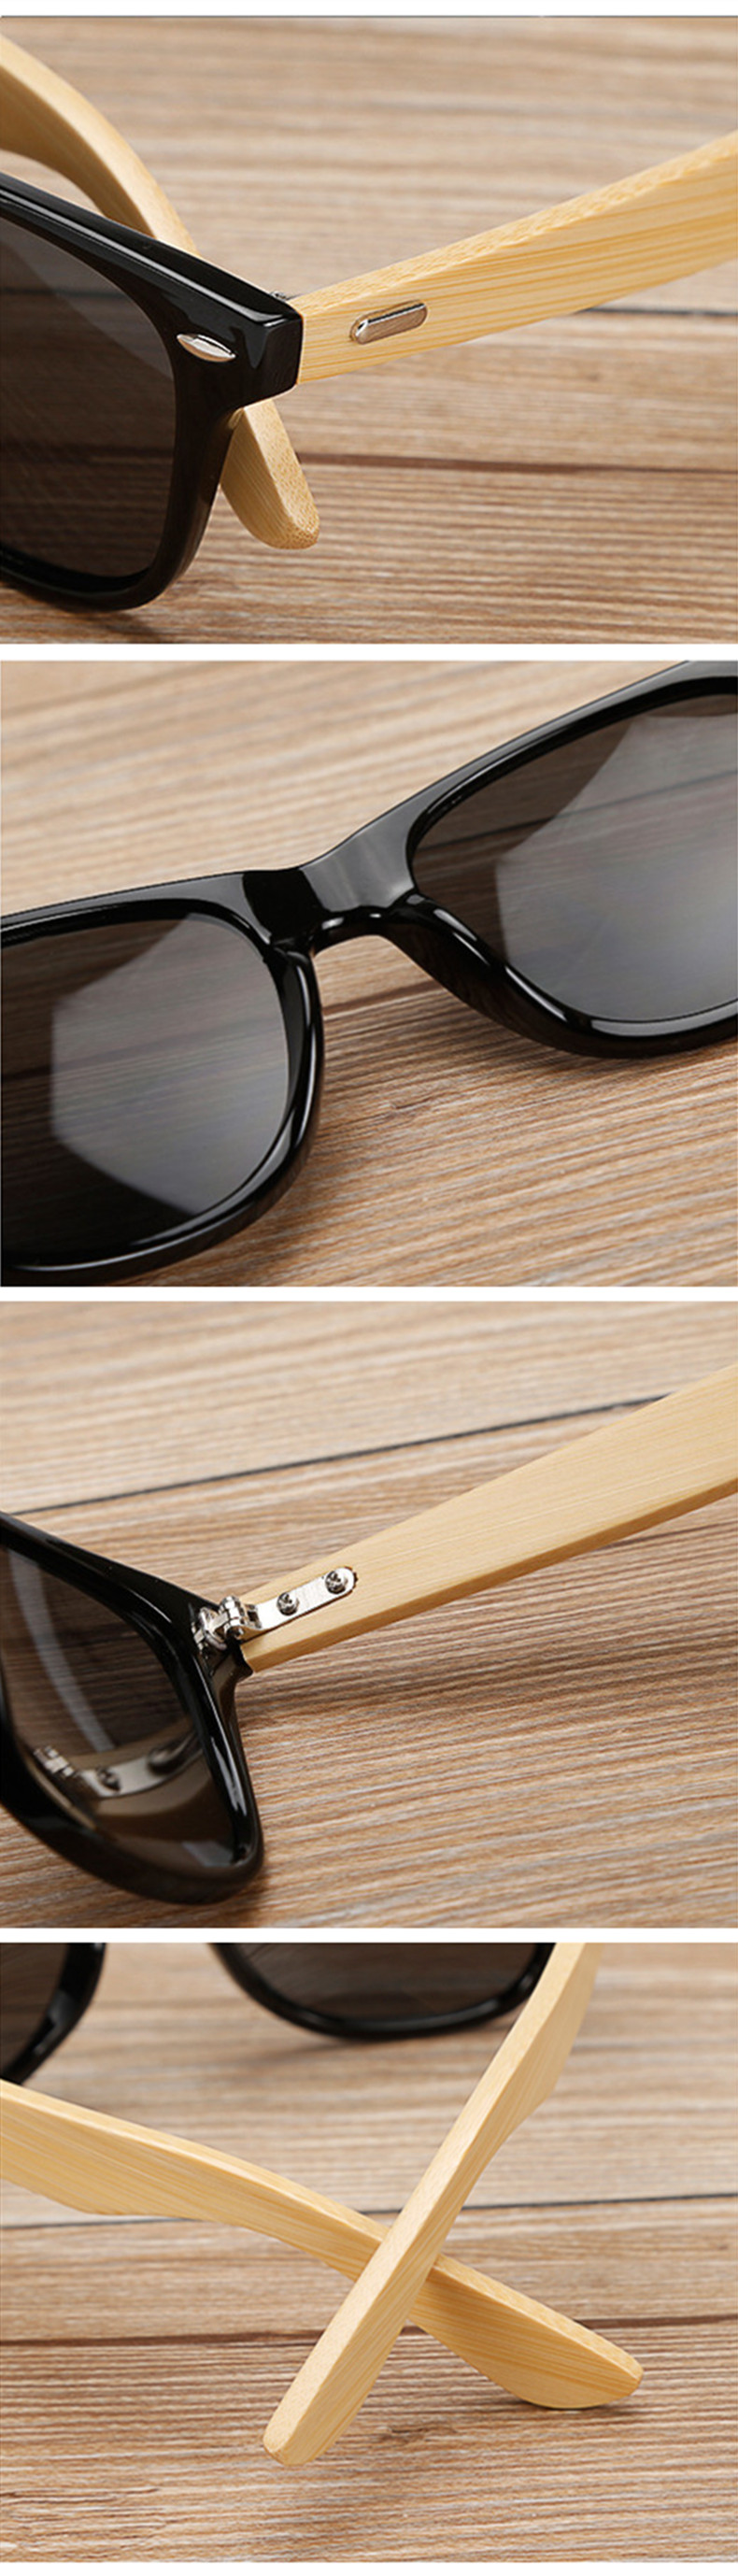 Bamboo Sunglasses Men Women Travel Goggles Sun Glasses Vintage Wooden Leg Eyeglasses Fashion Brand Design Sunglasses Male Female 19